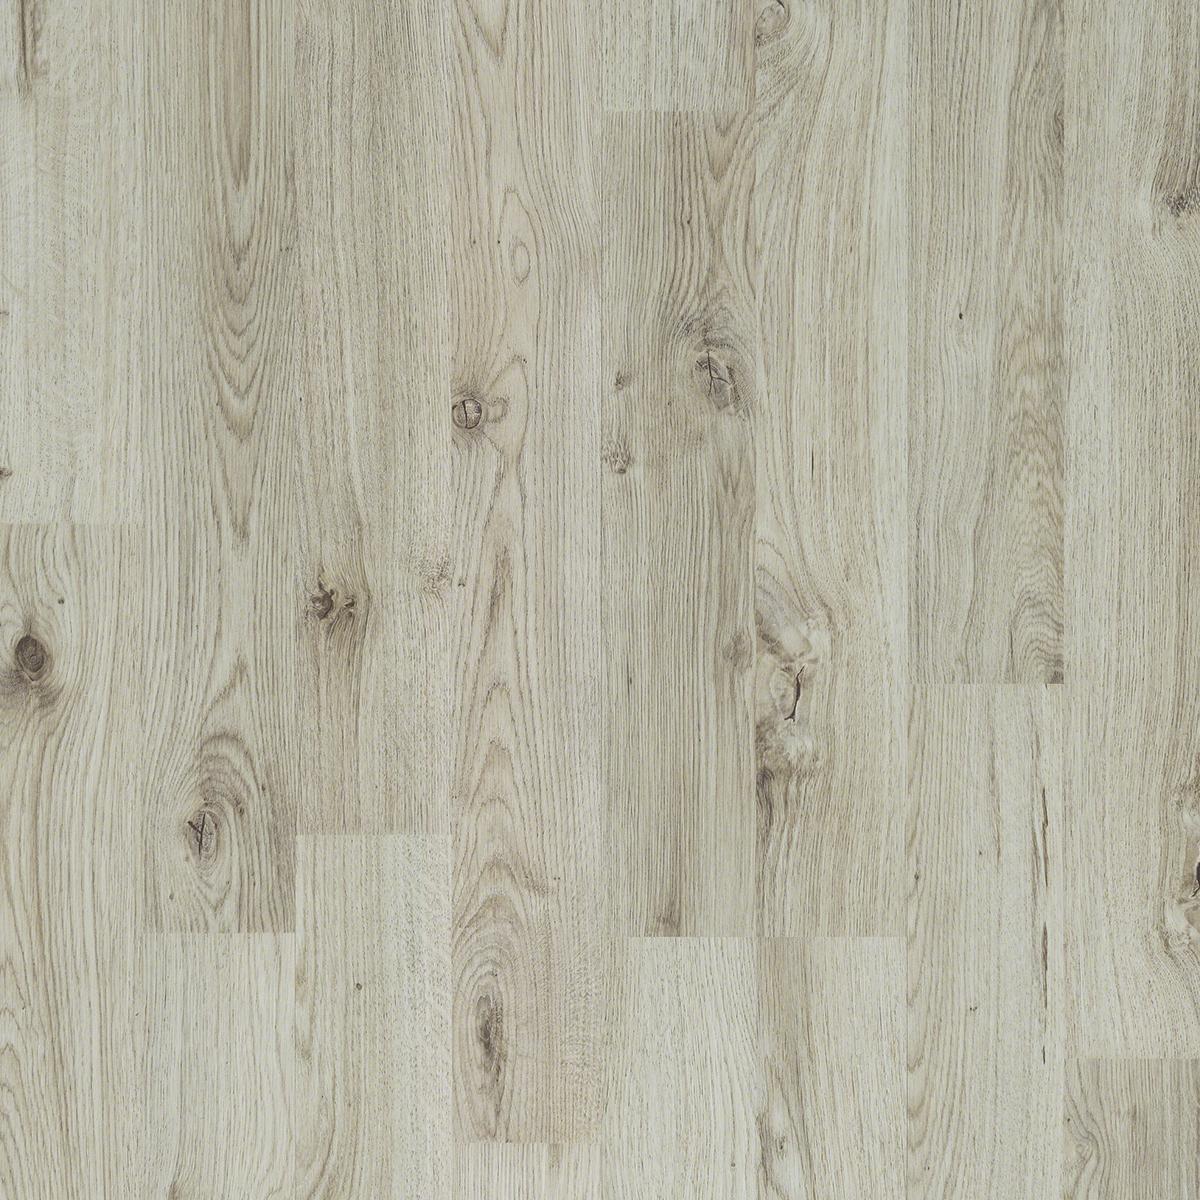 hardwood flooring omaha ne of shaw vision works warm gold laminate nebraska furniture mart intended for not on display in omaha store